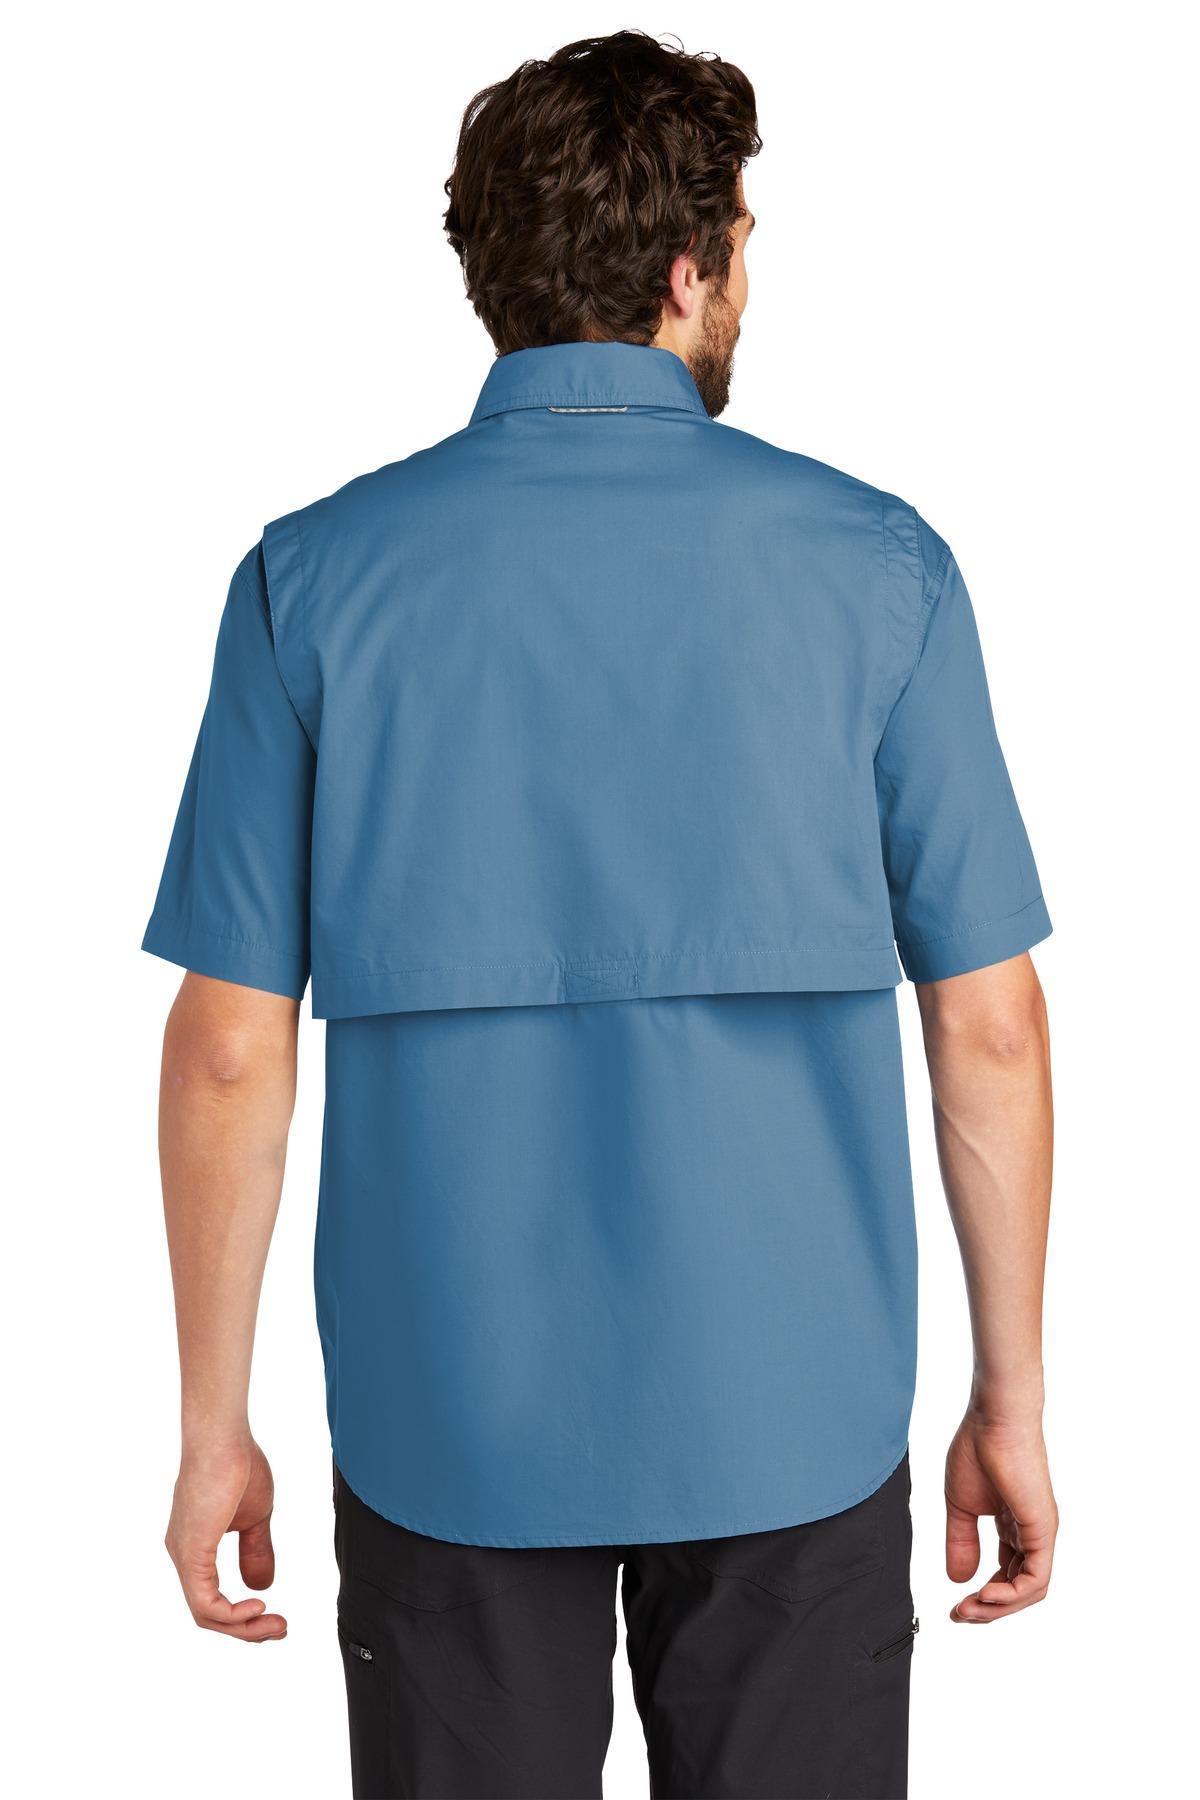 EB bluegill model back